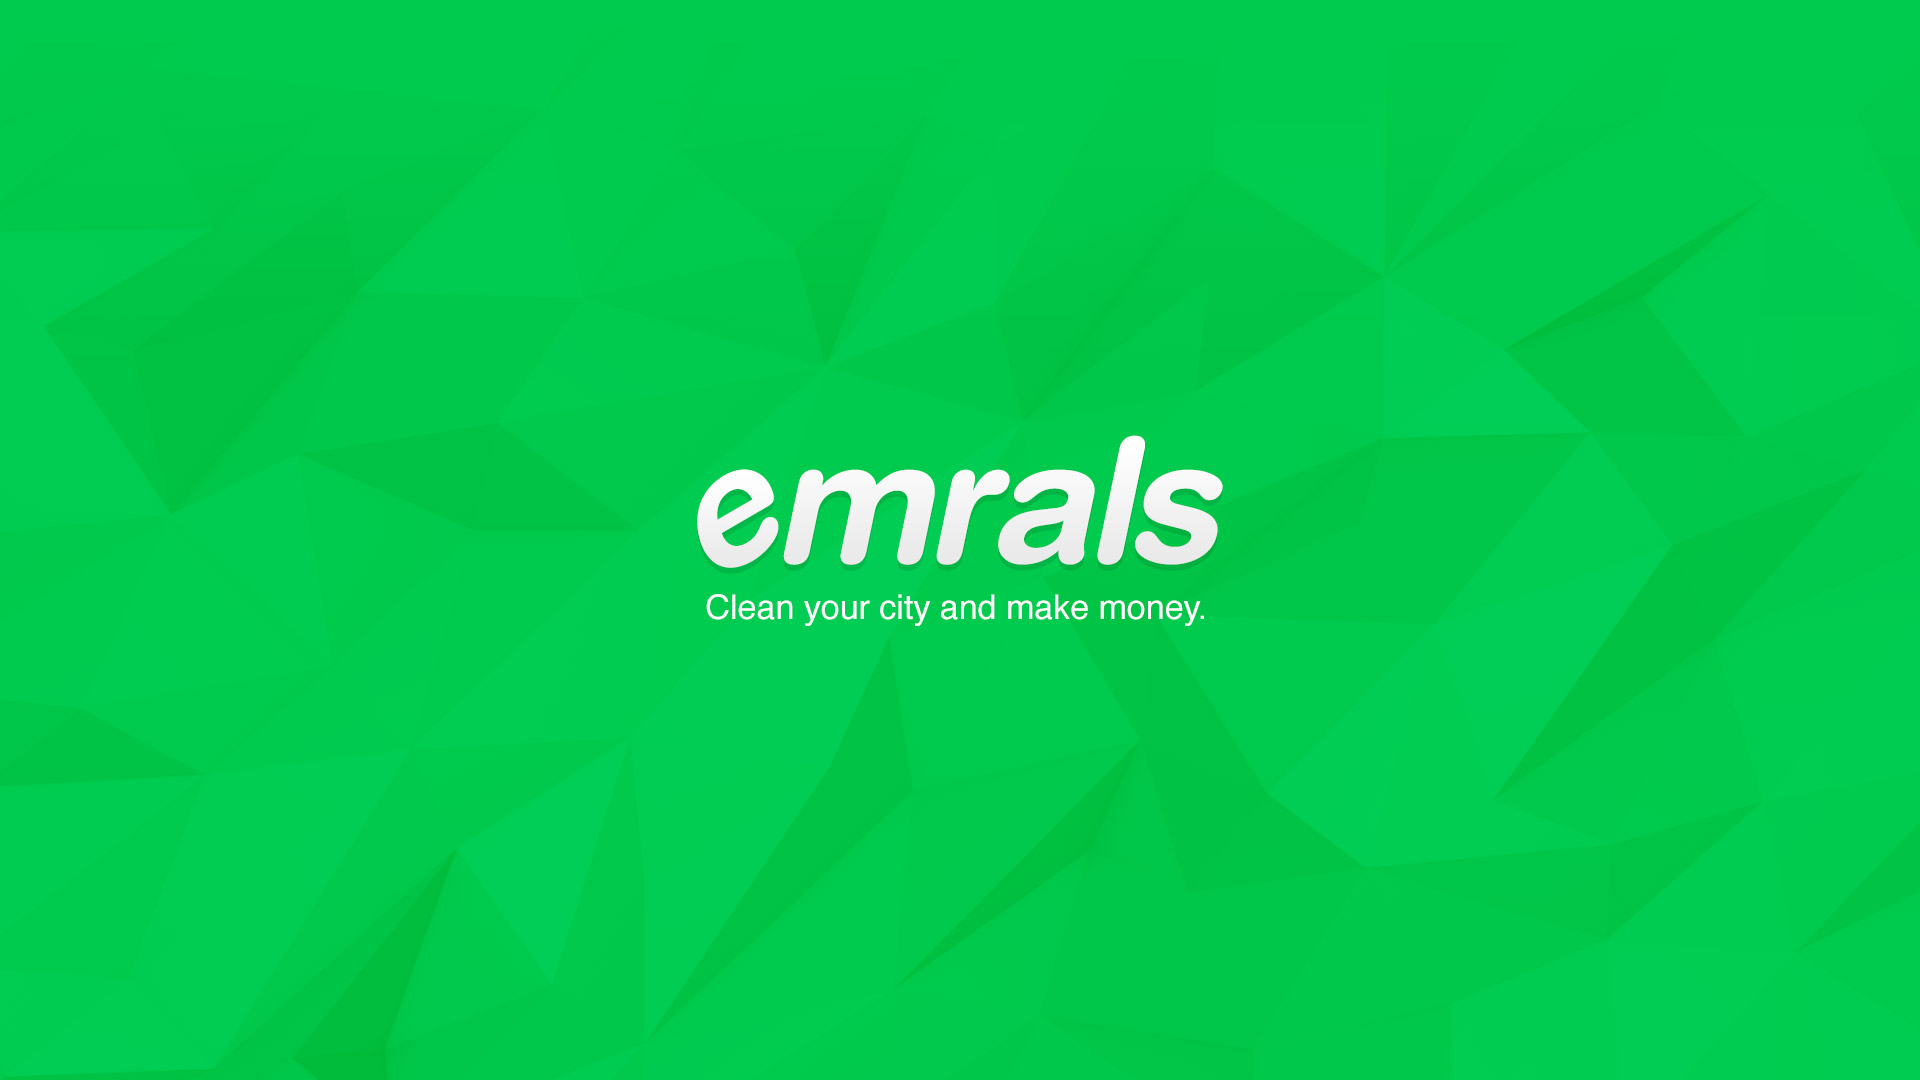 Emrals_Full